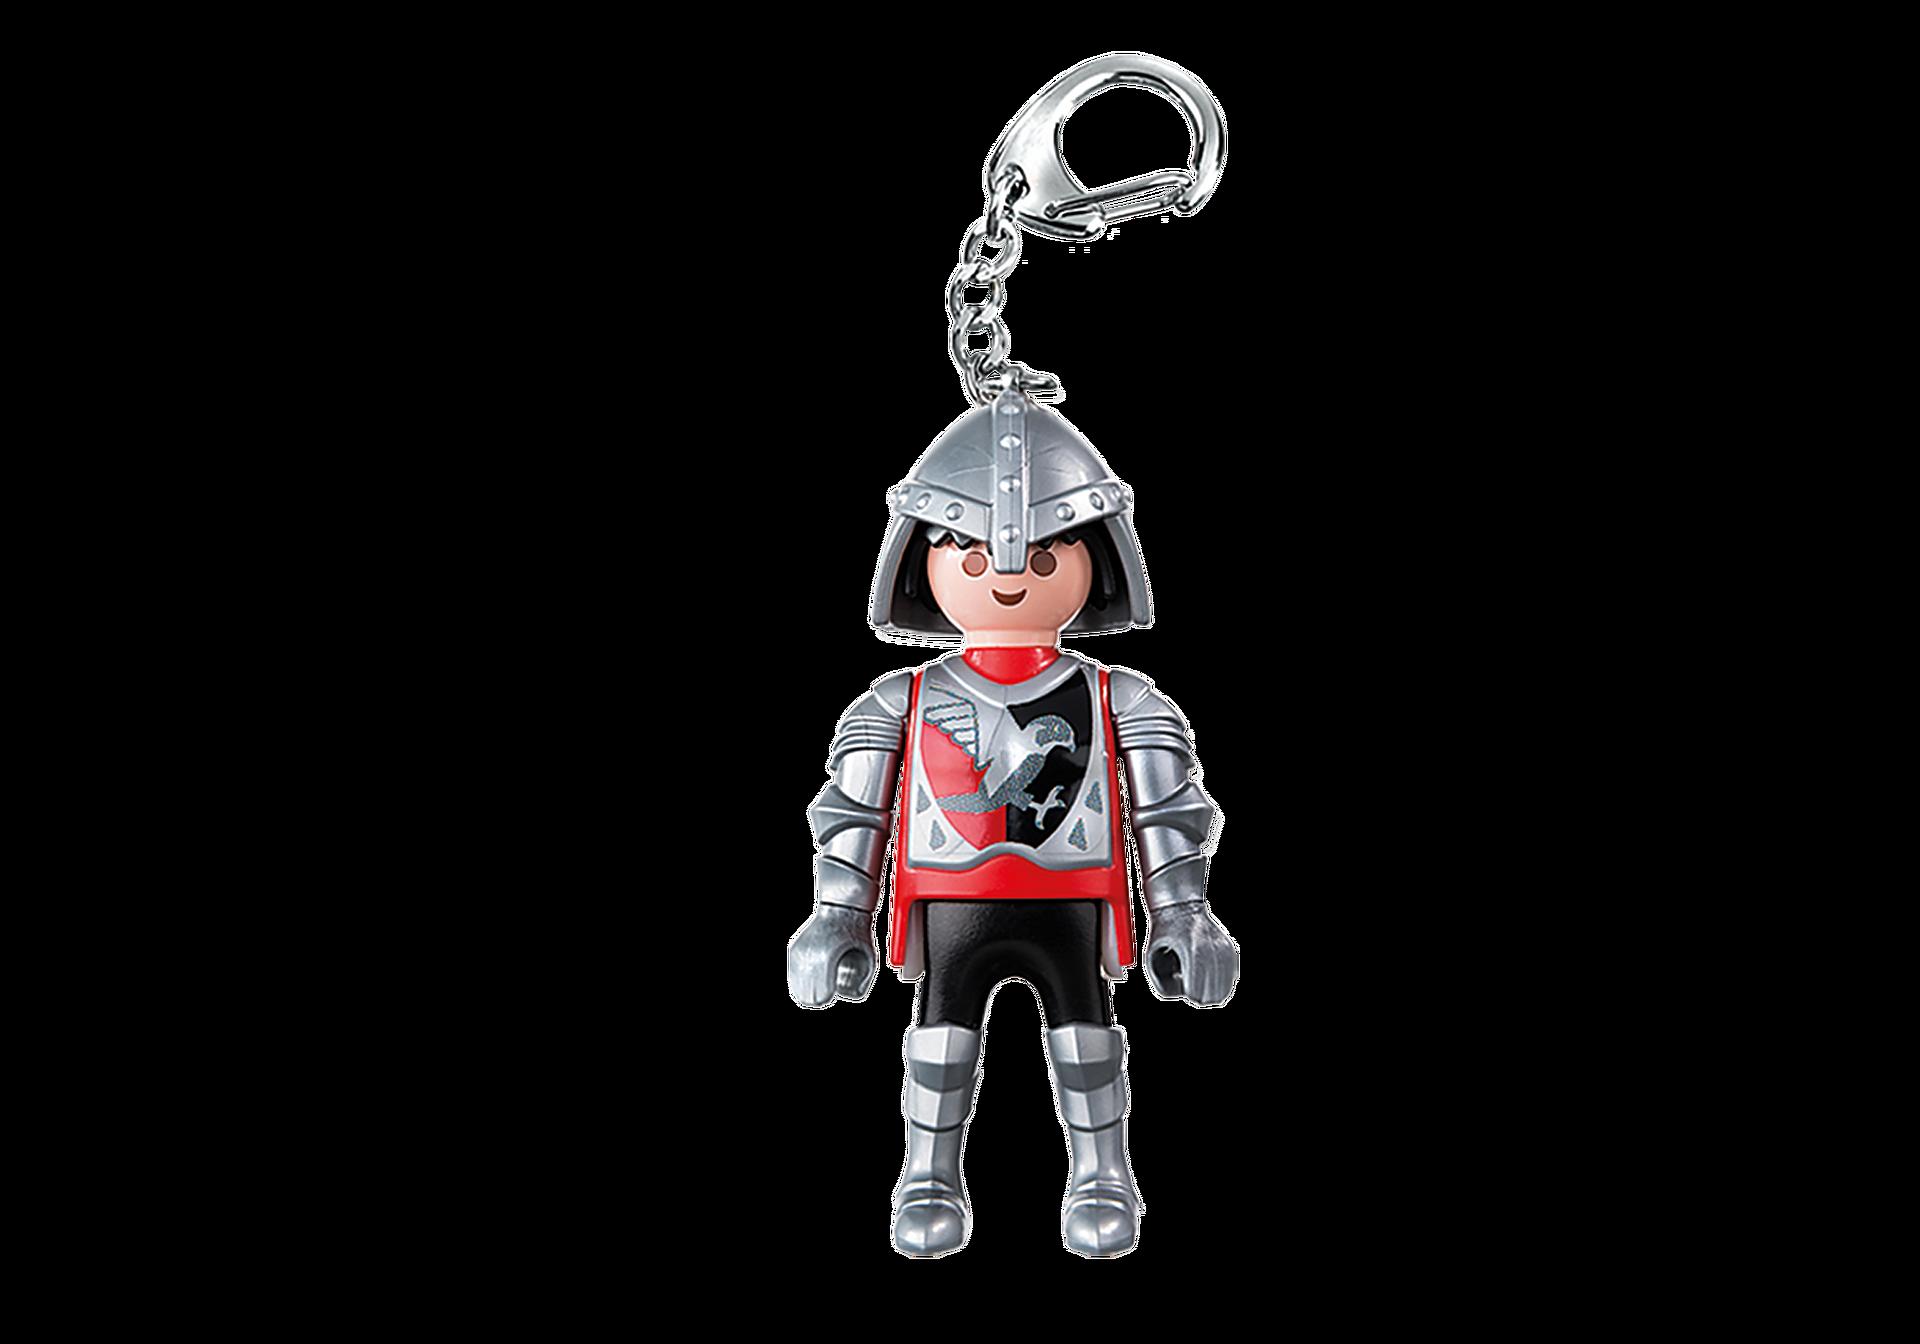 http://media.playmobil.com/i/playmobil/6616_product_detail/Knight Keyring